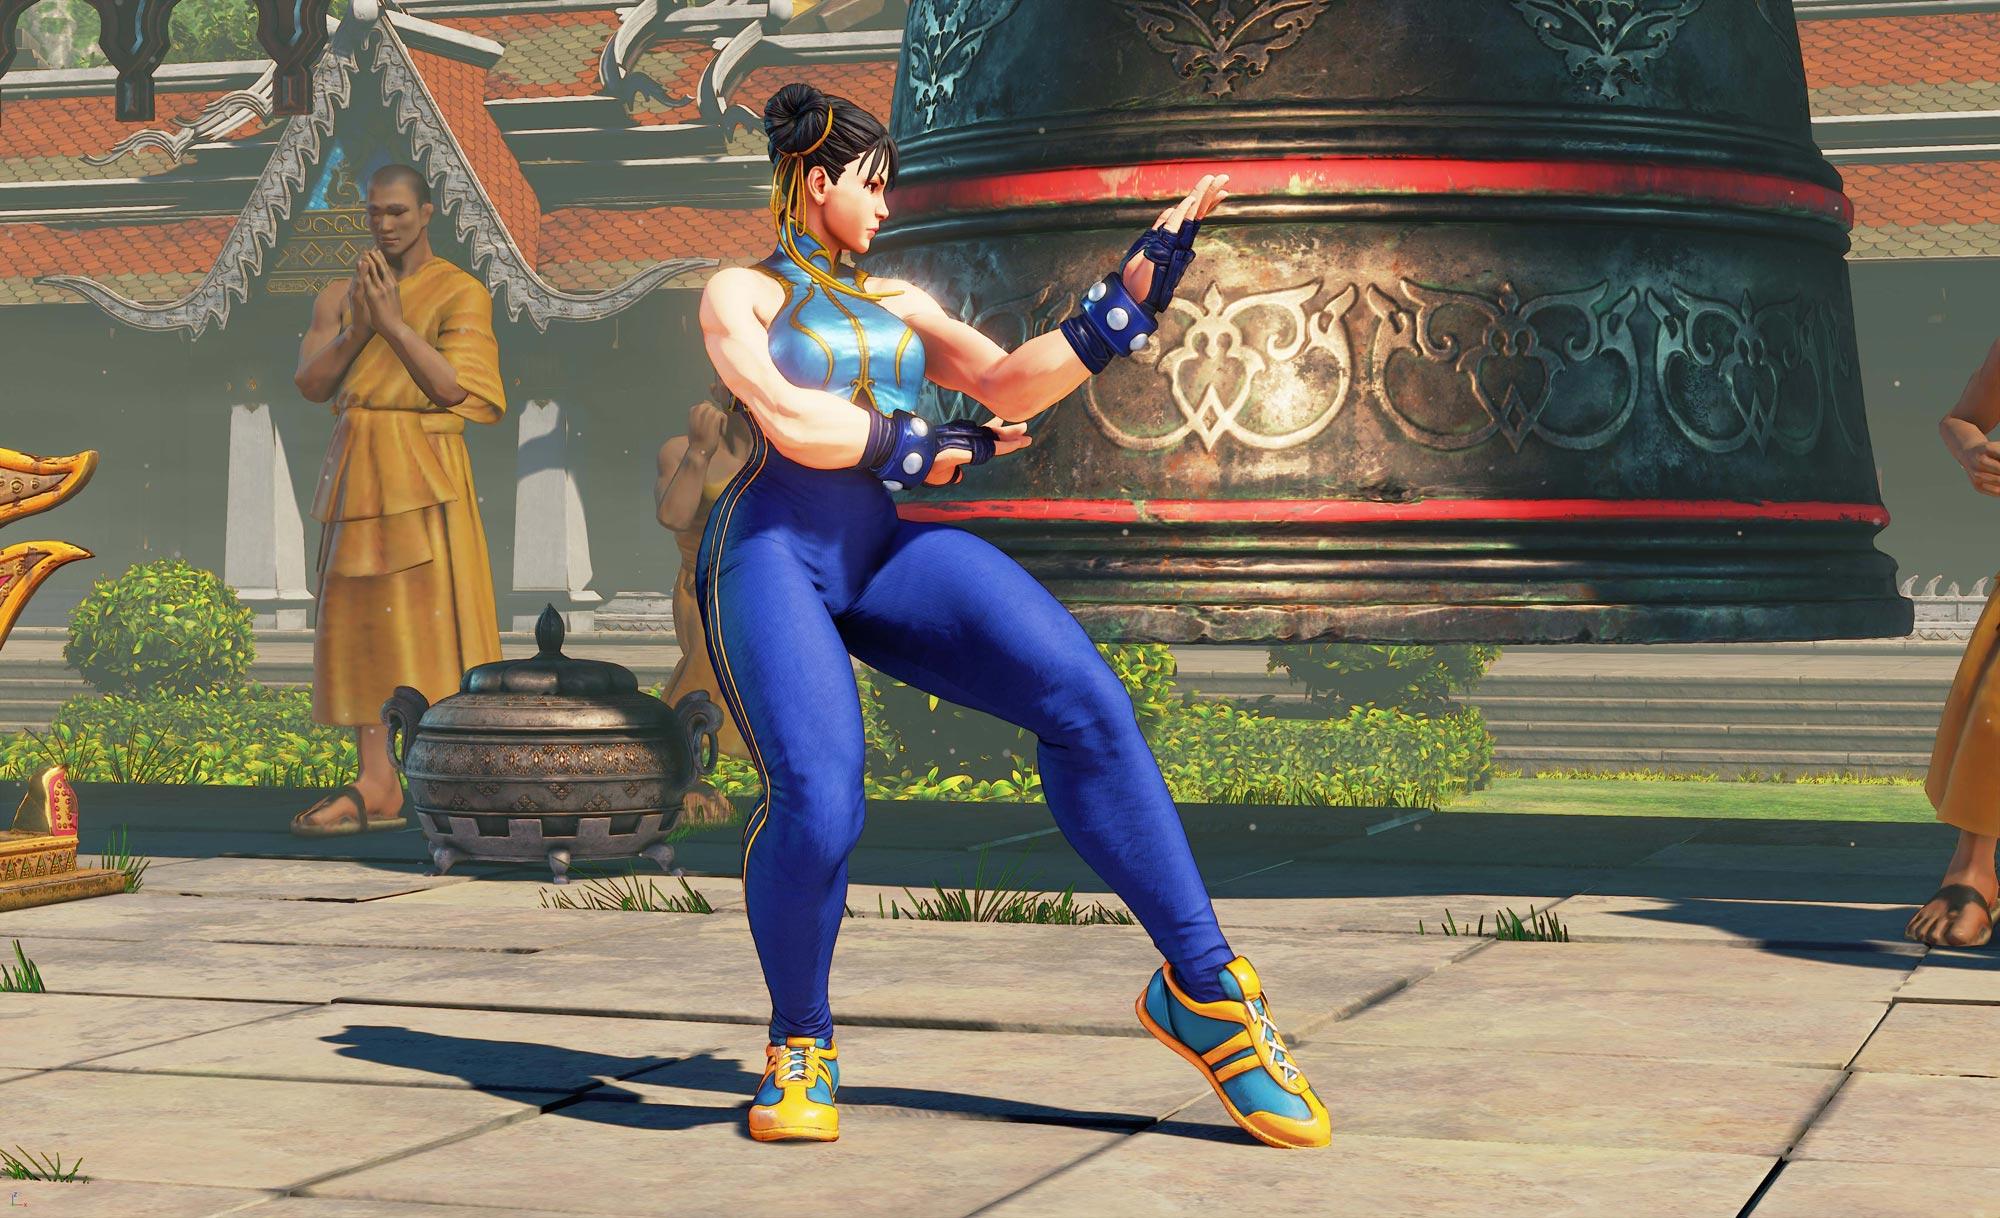 Chun-Li's Street Fighter 5 wardrobe 10 out of 13 image gallery